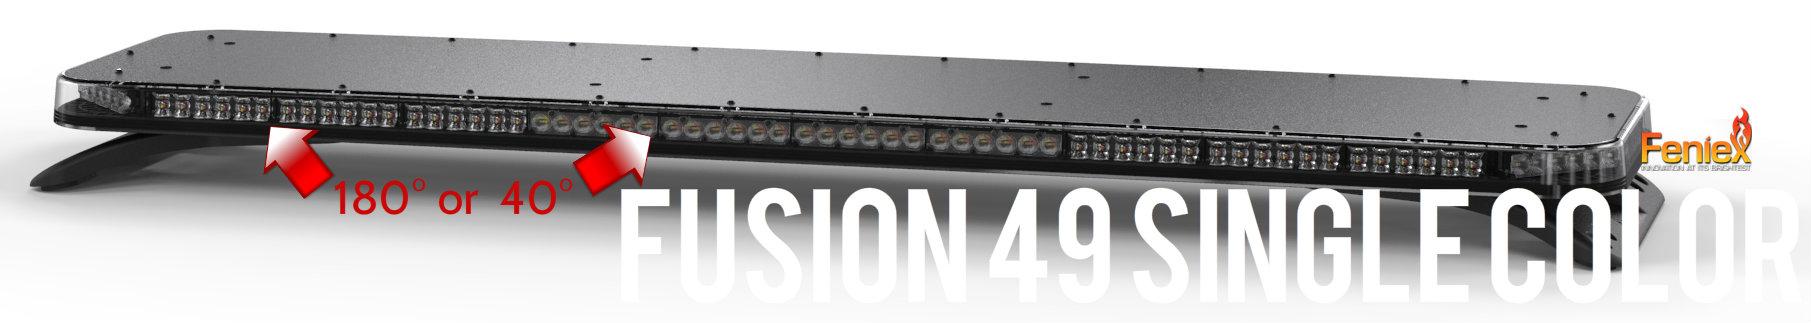 feniex-fusion-49-lightbar-single-color-covertlights.jpg